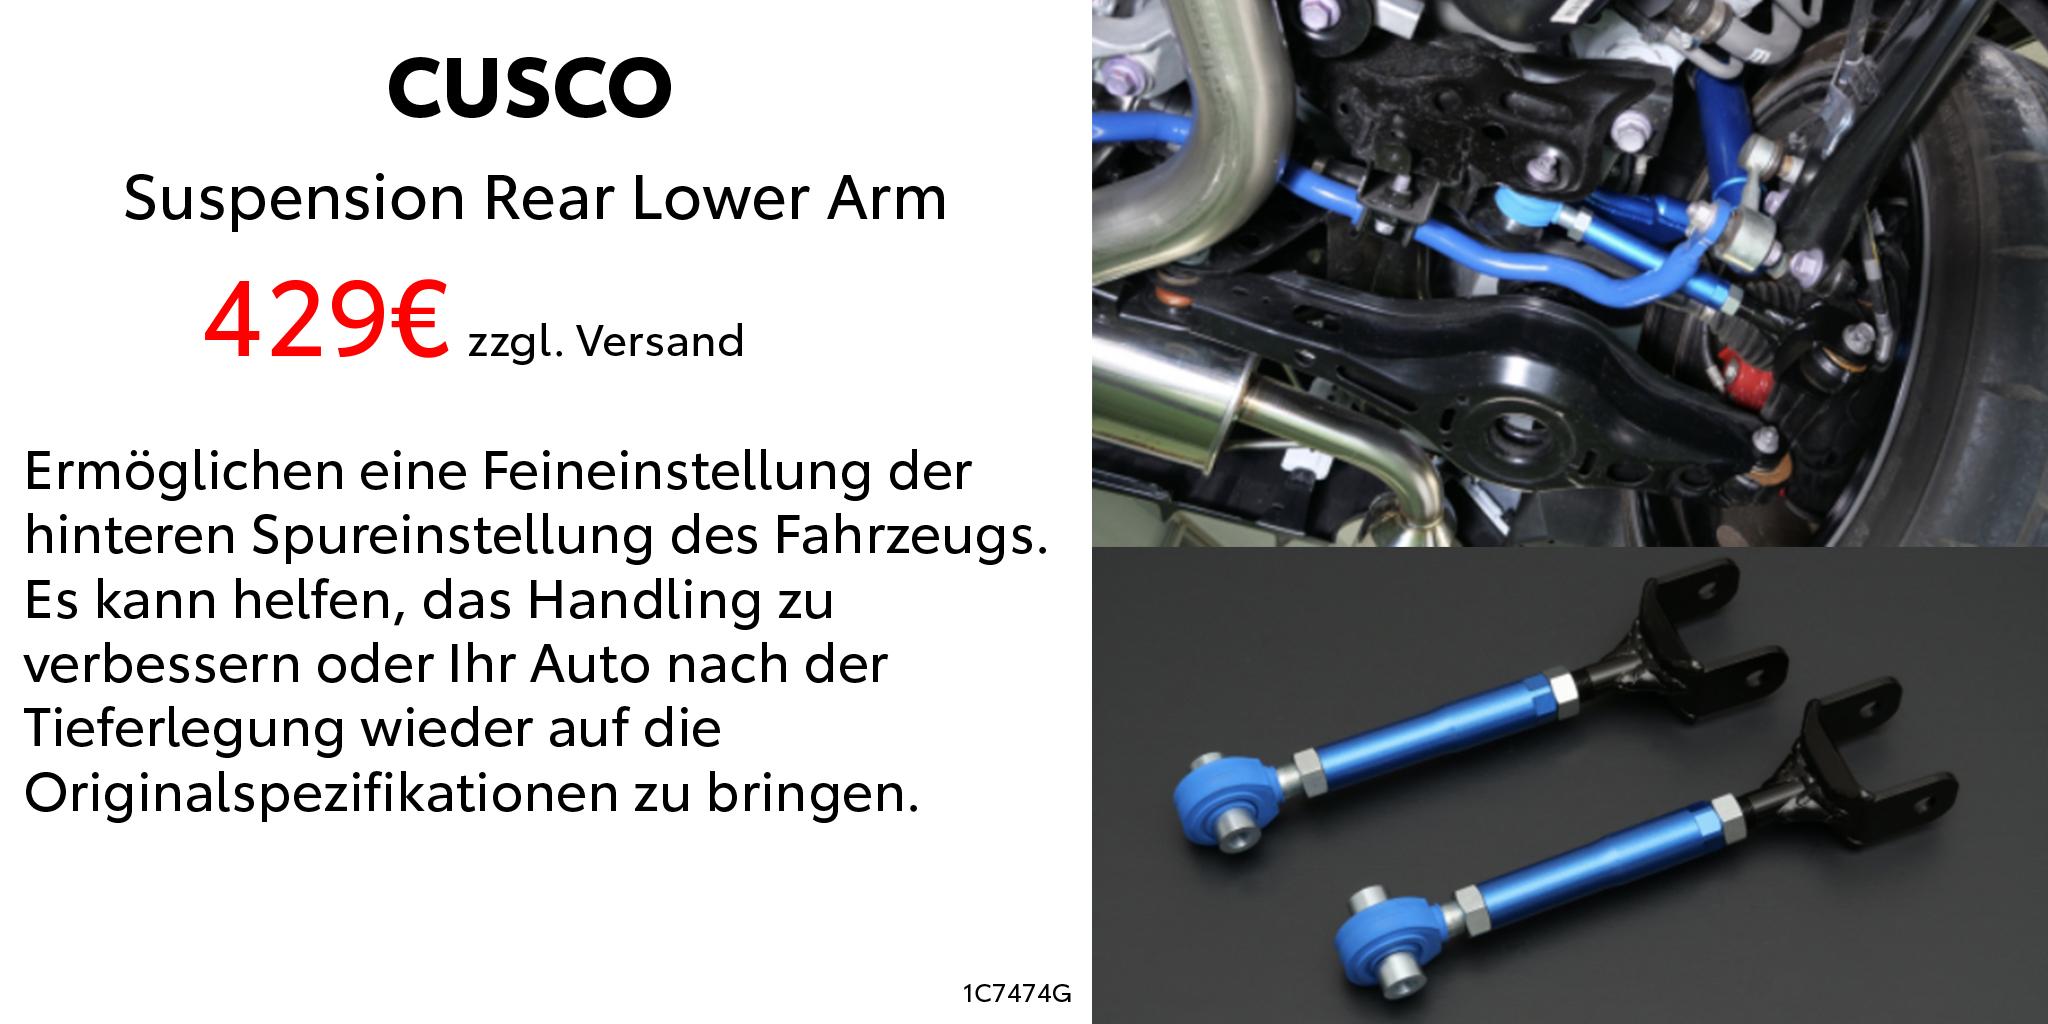 Cusco_Suspension-Rear-Lower-Arm